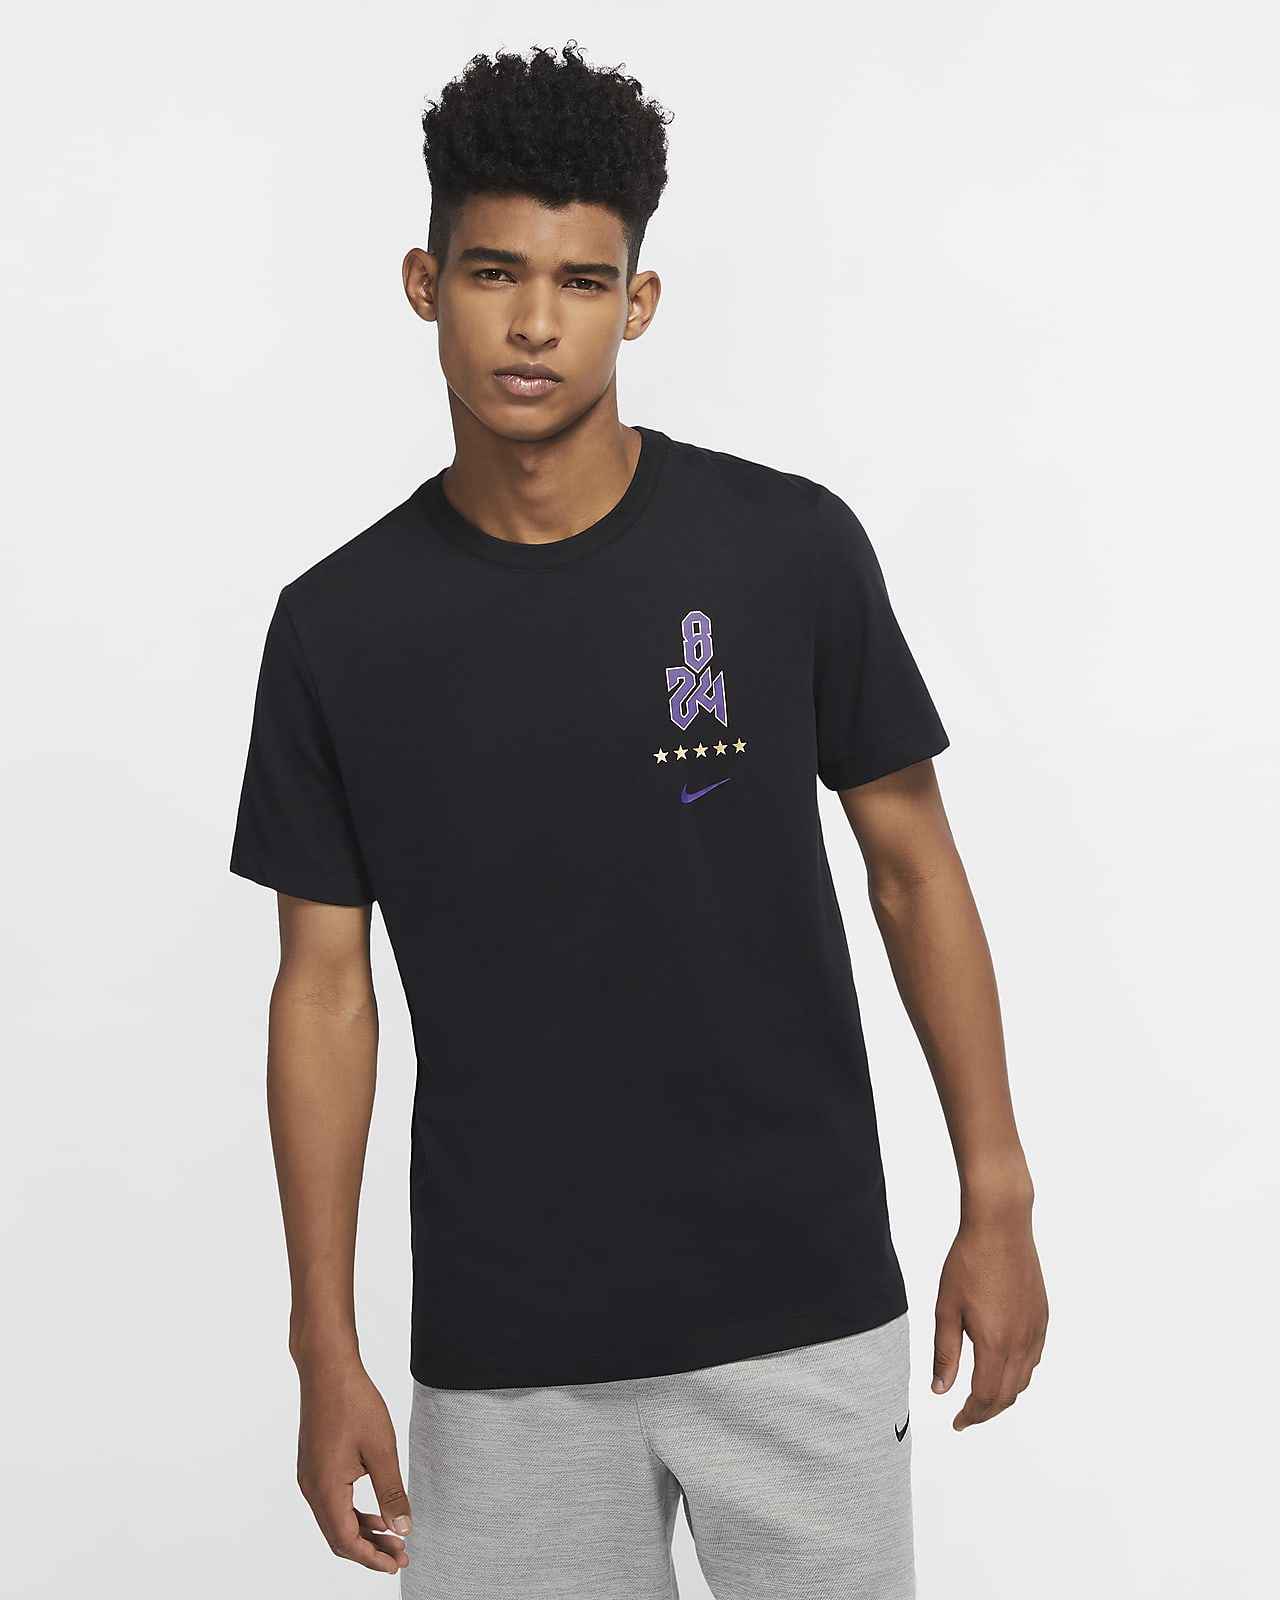 Kobe Logo Nike Dri-FIT 男子篮球T恤